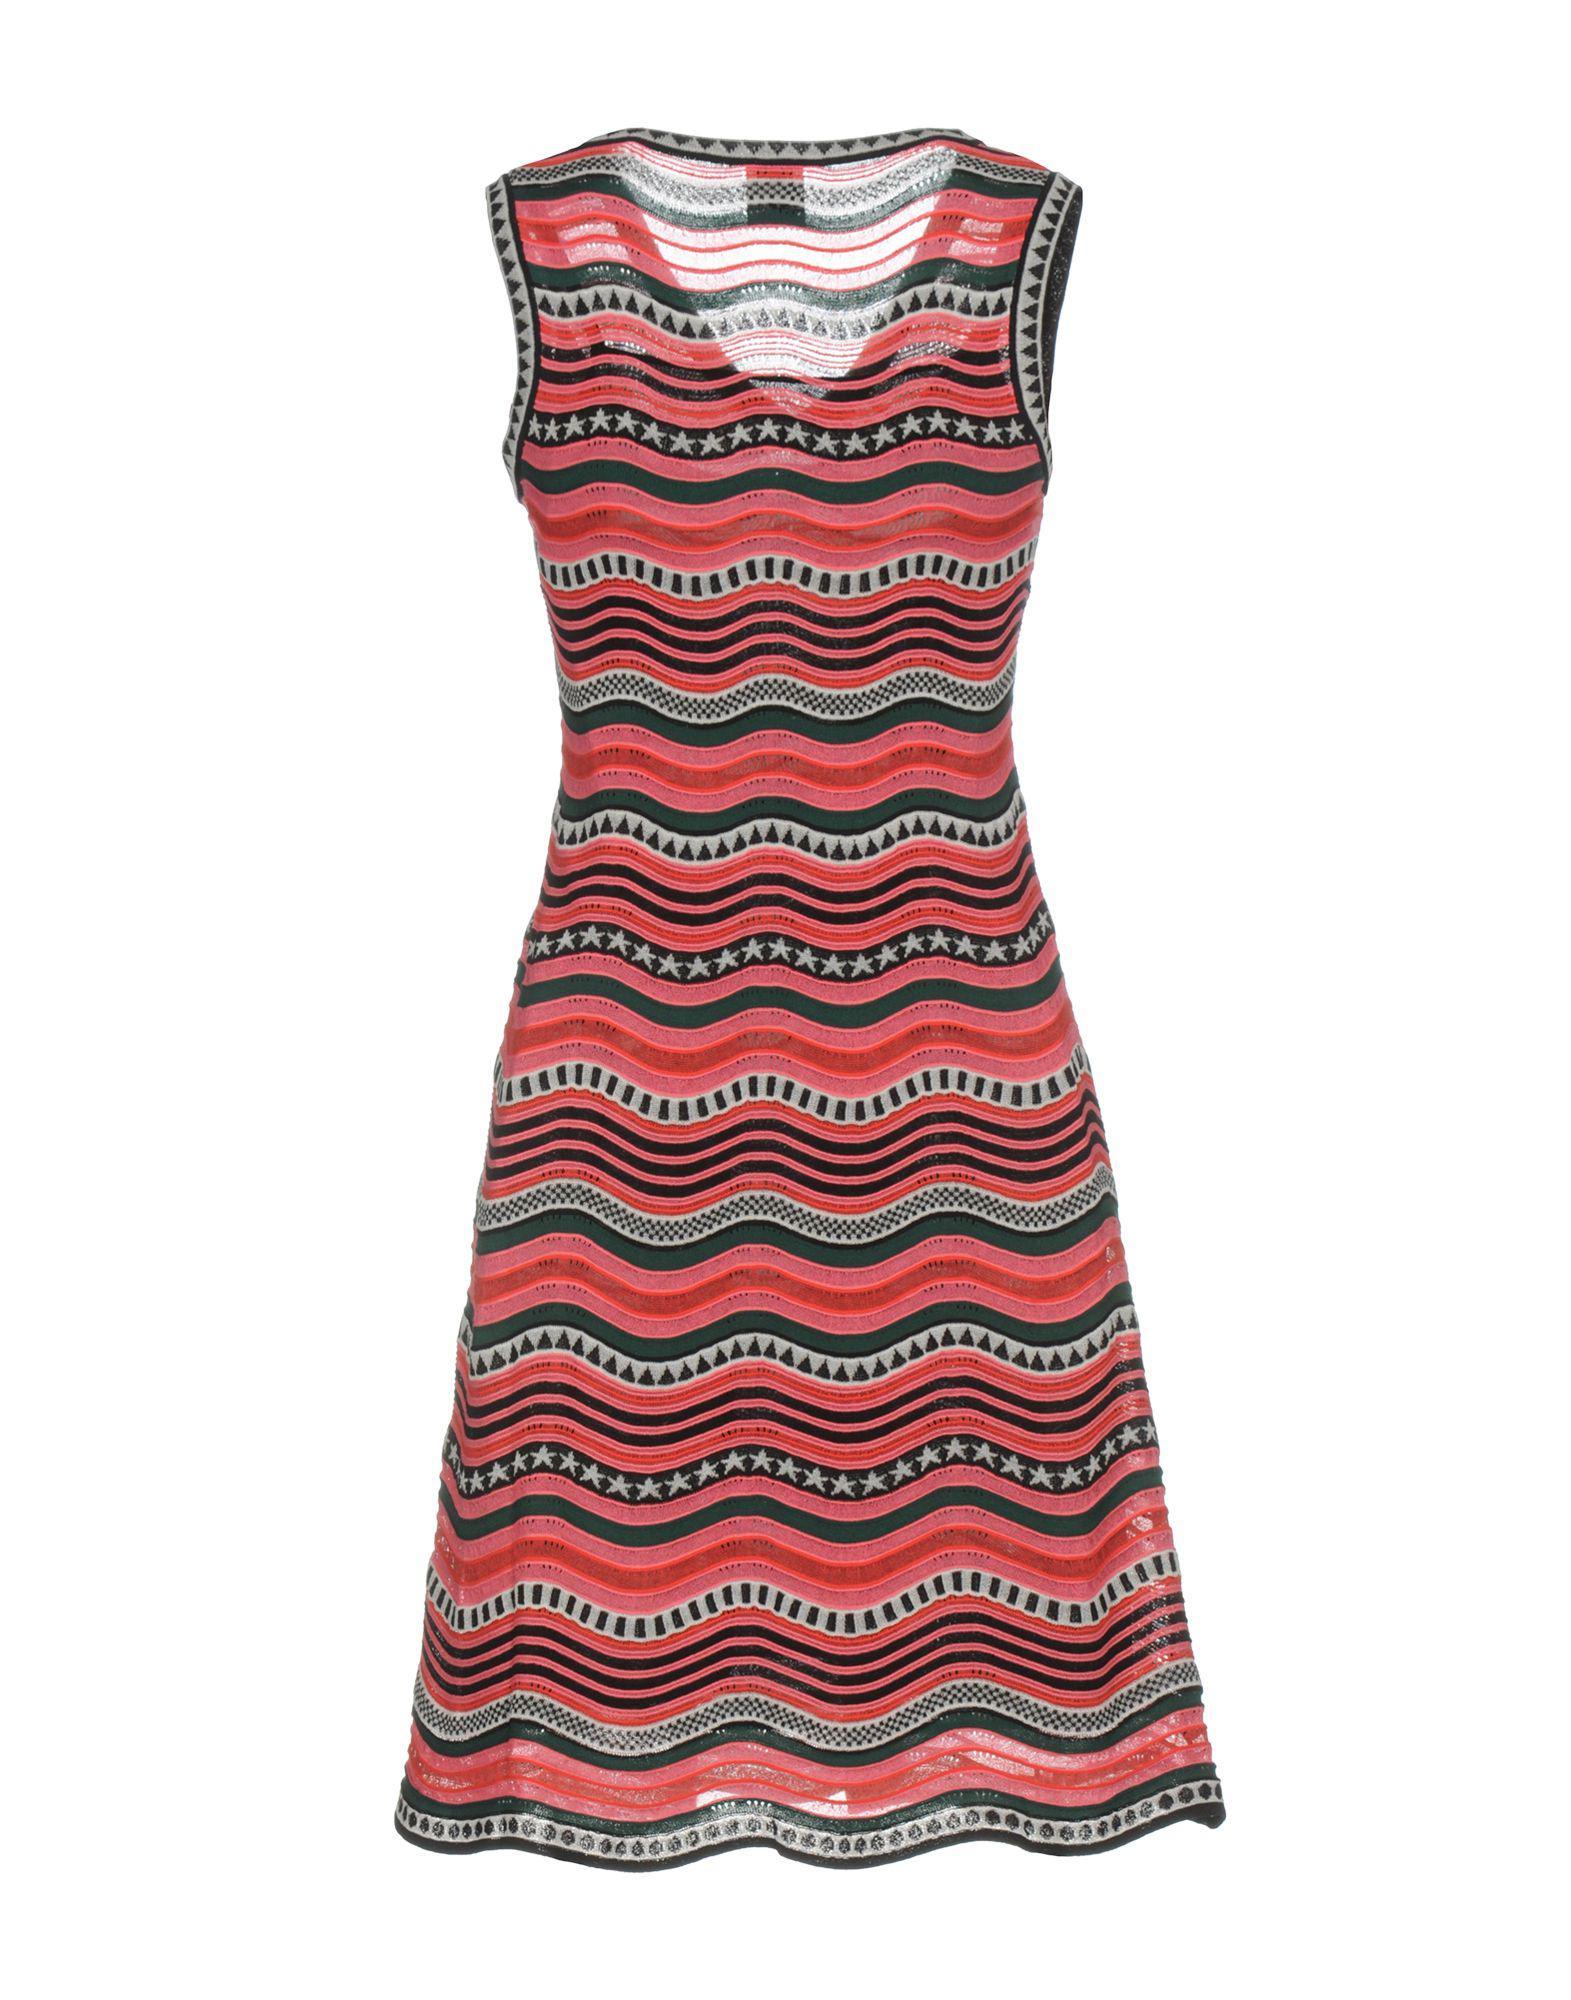 49417d829d8e M Missoni Short Dress in Red - Lyst